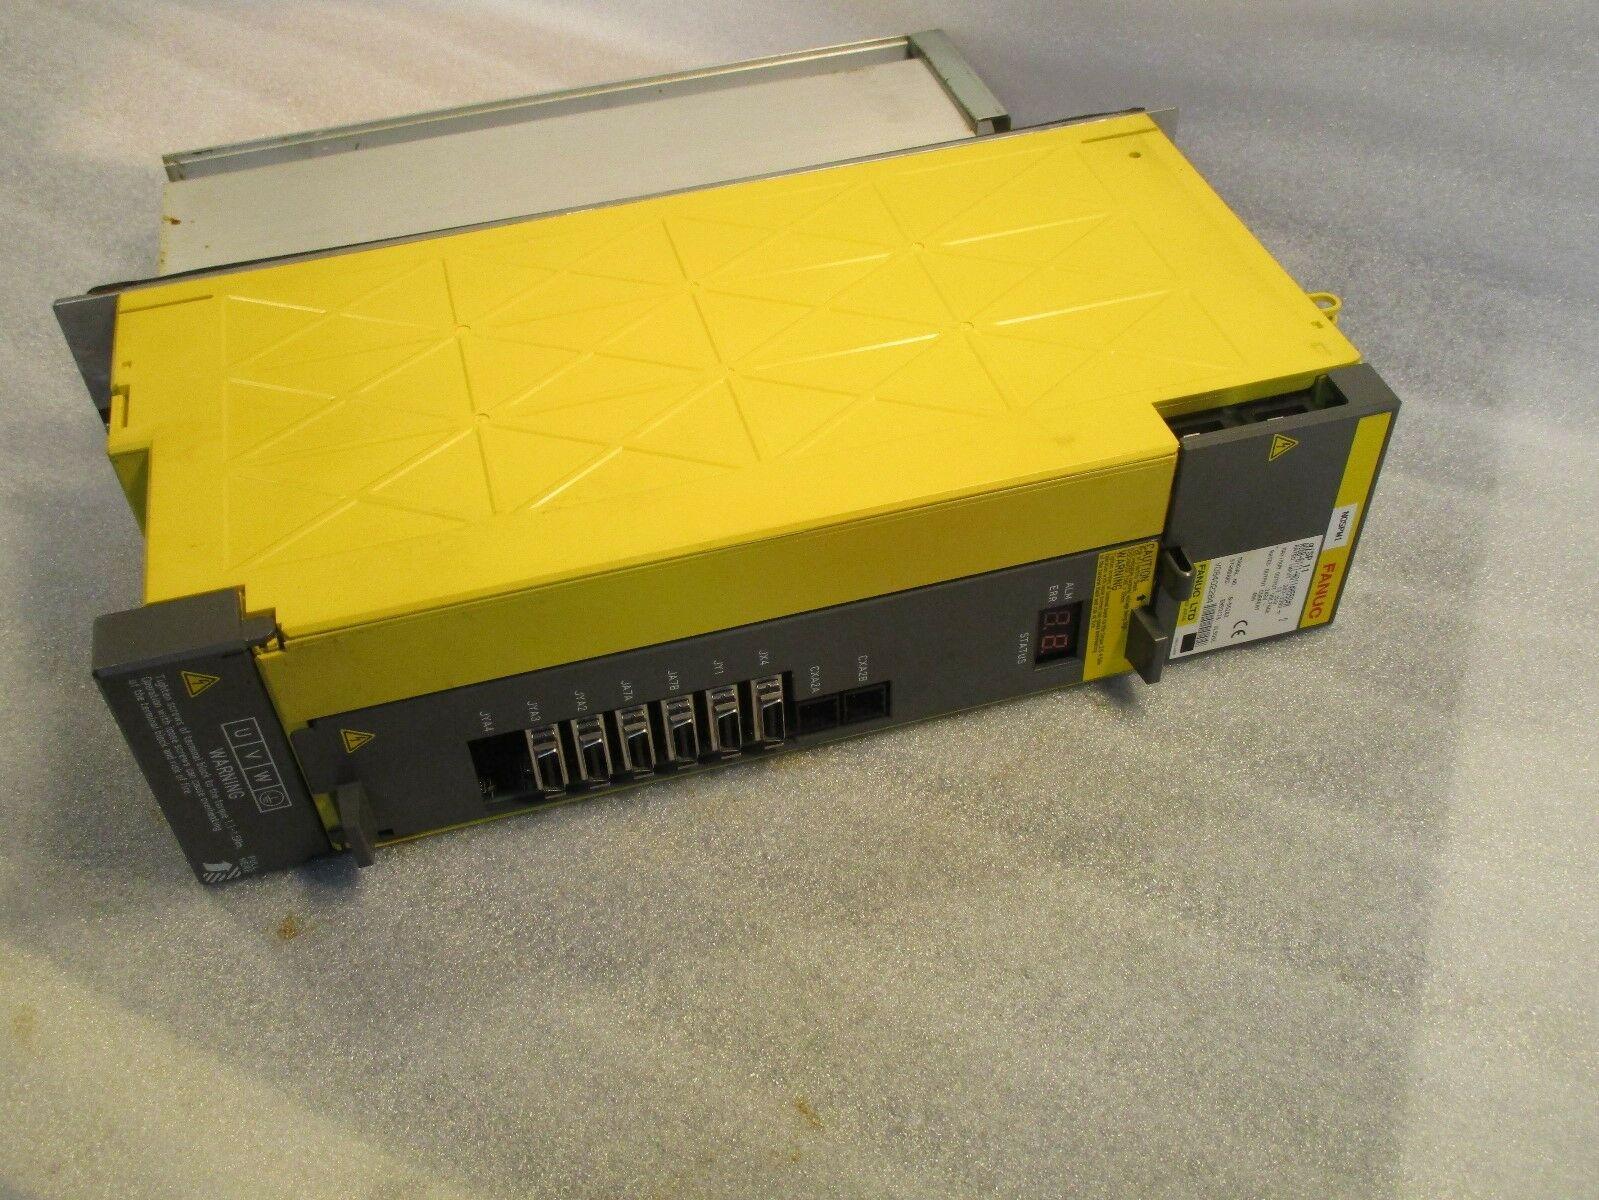 Fanuc A06B-6111-H011 #H550 Fanuc Alpha iSP 11 Drive